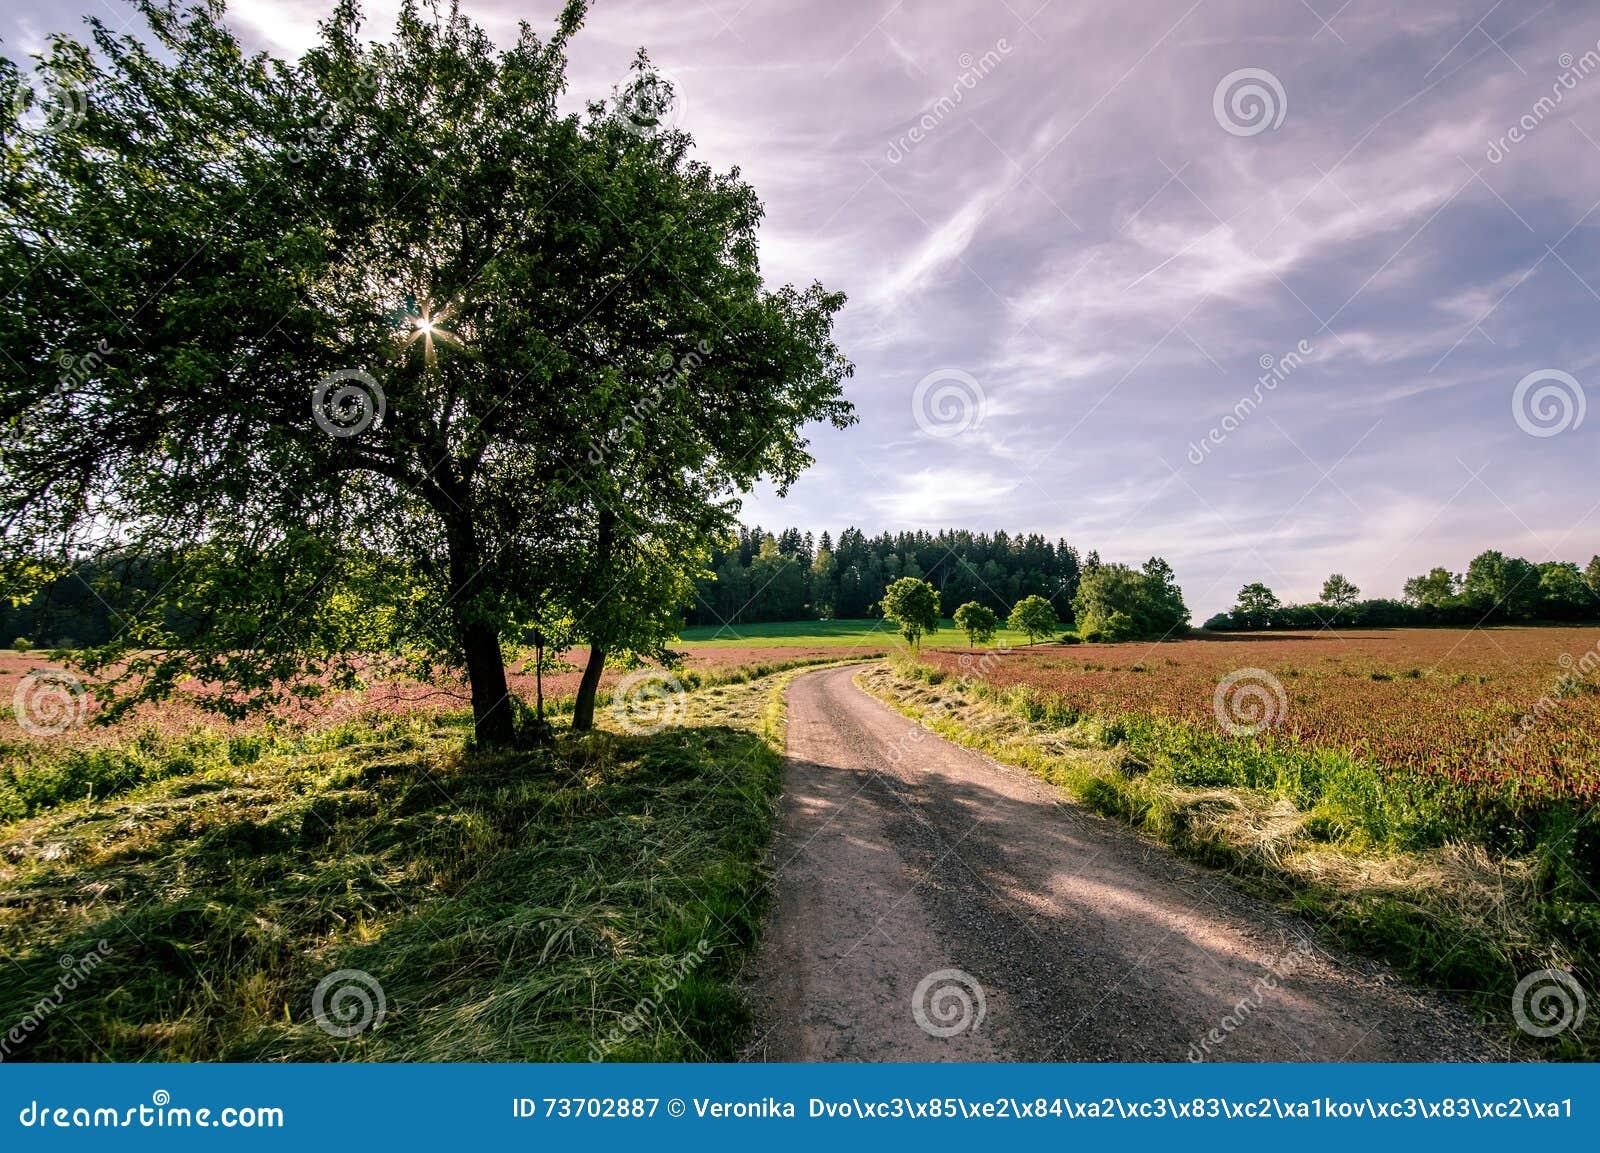 Дорога между полями клевера